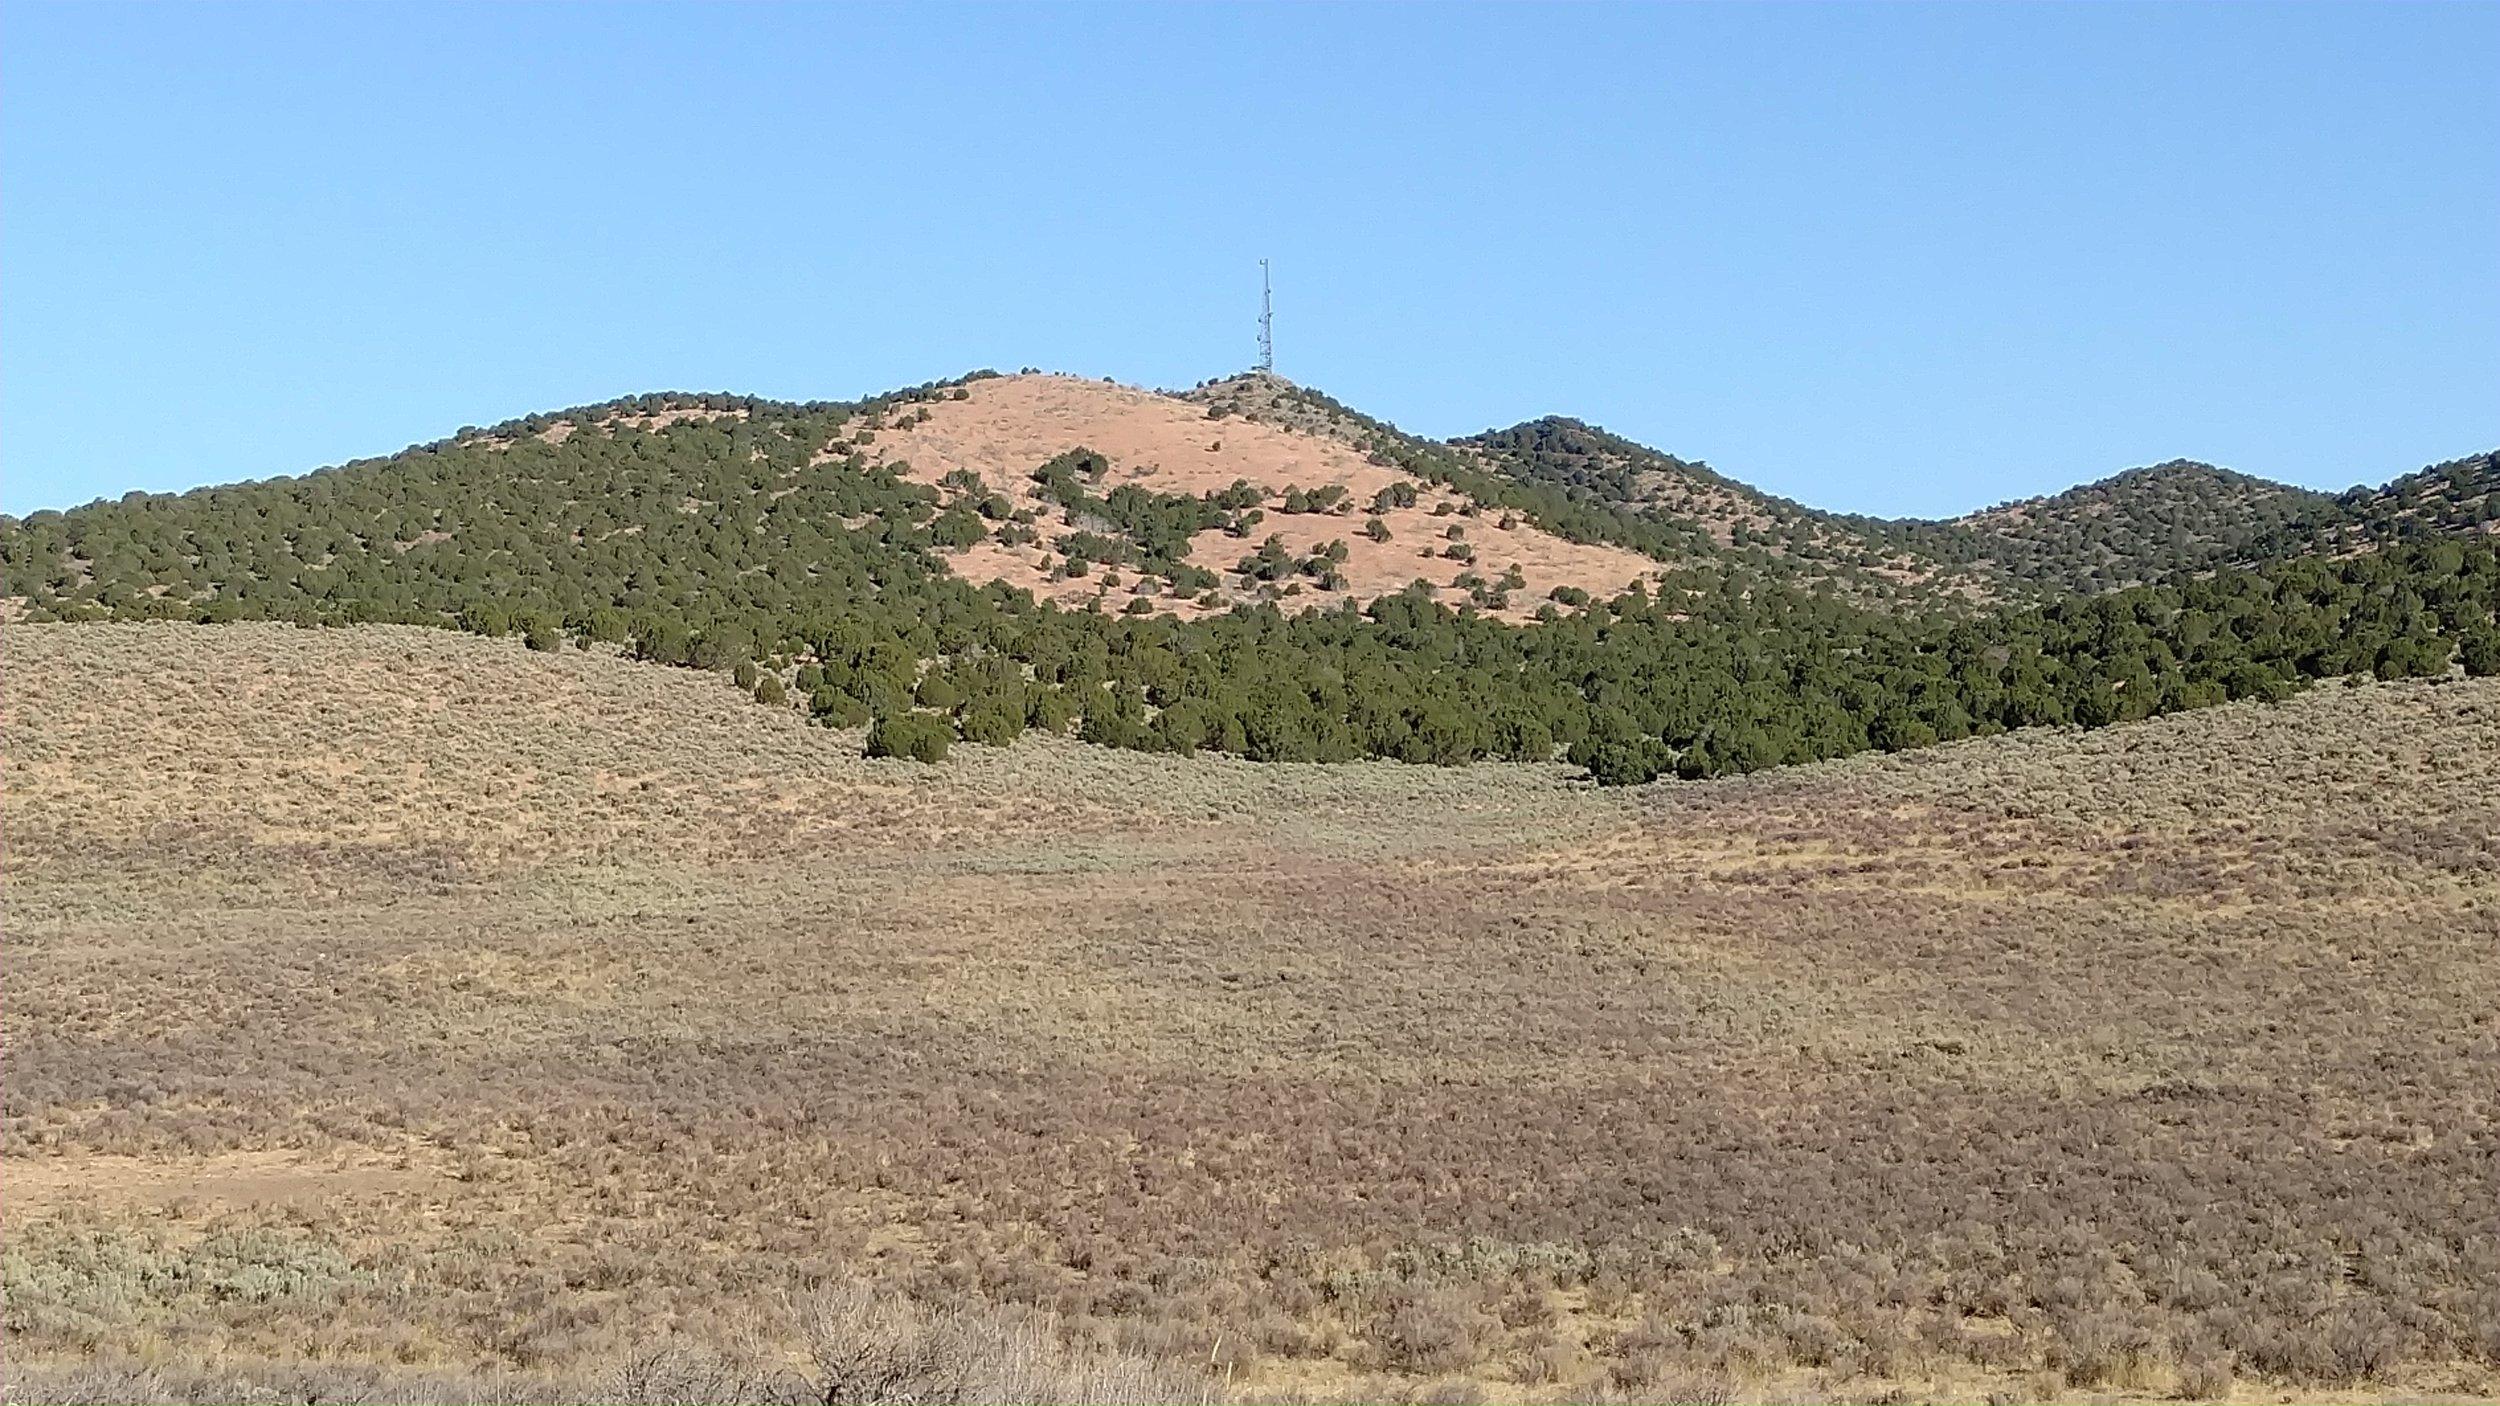 Unnamed Peak 7460; Iron County; Baboon Peak - UT quad; Rise 320'; UT Rank: 1,836